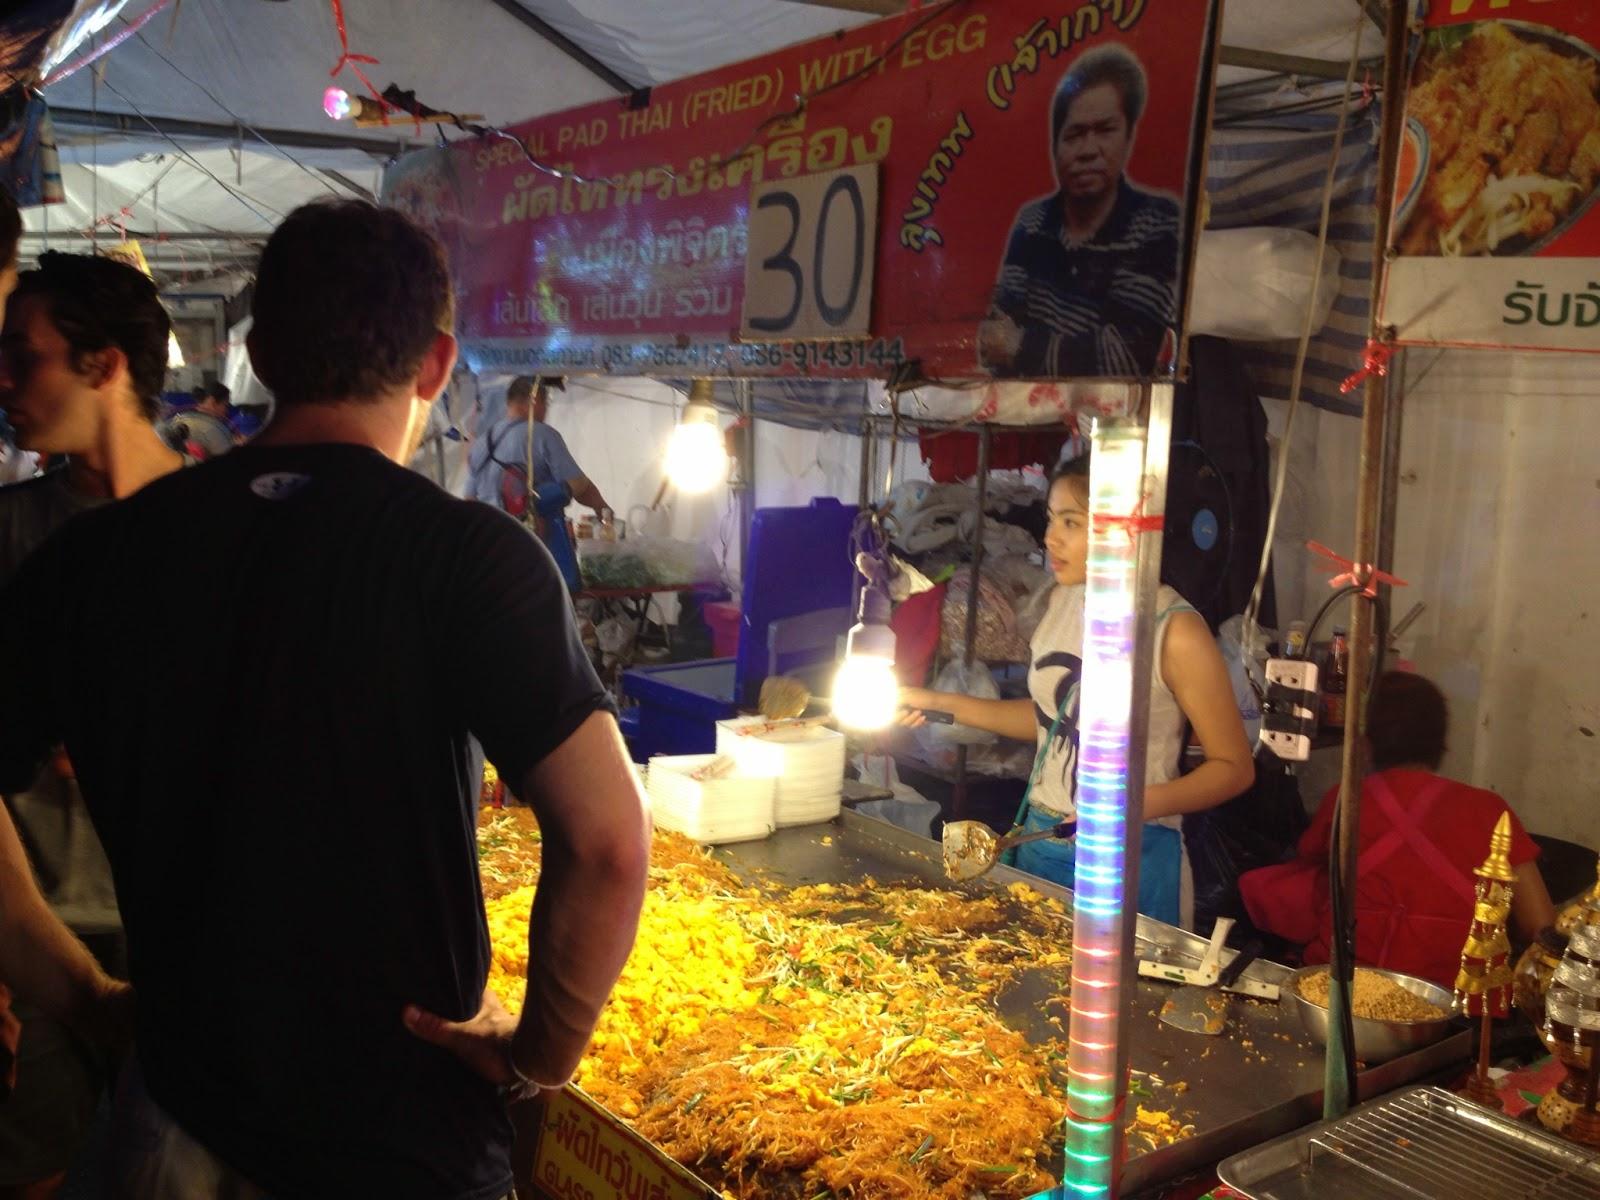 Chiang Mai - Pad thai for 30 baht!